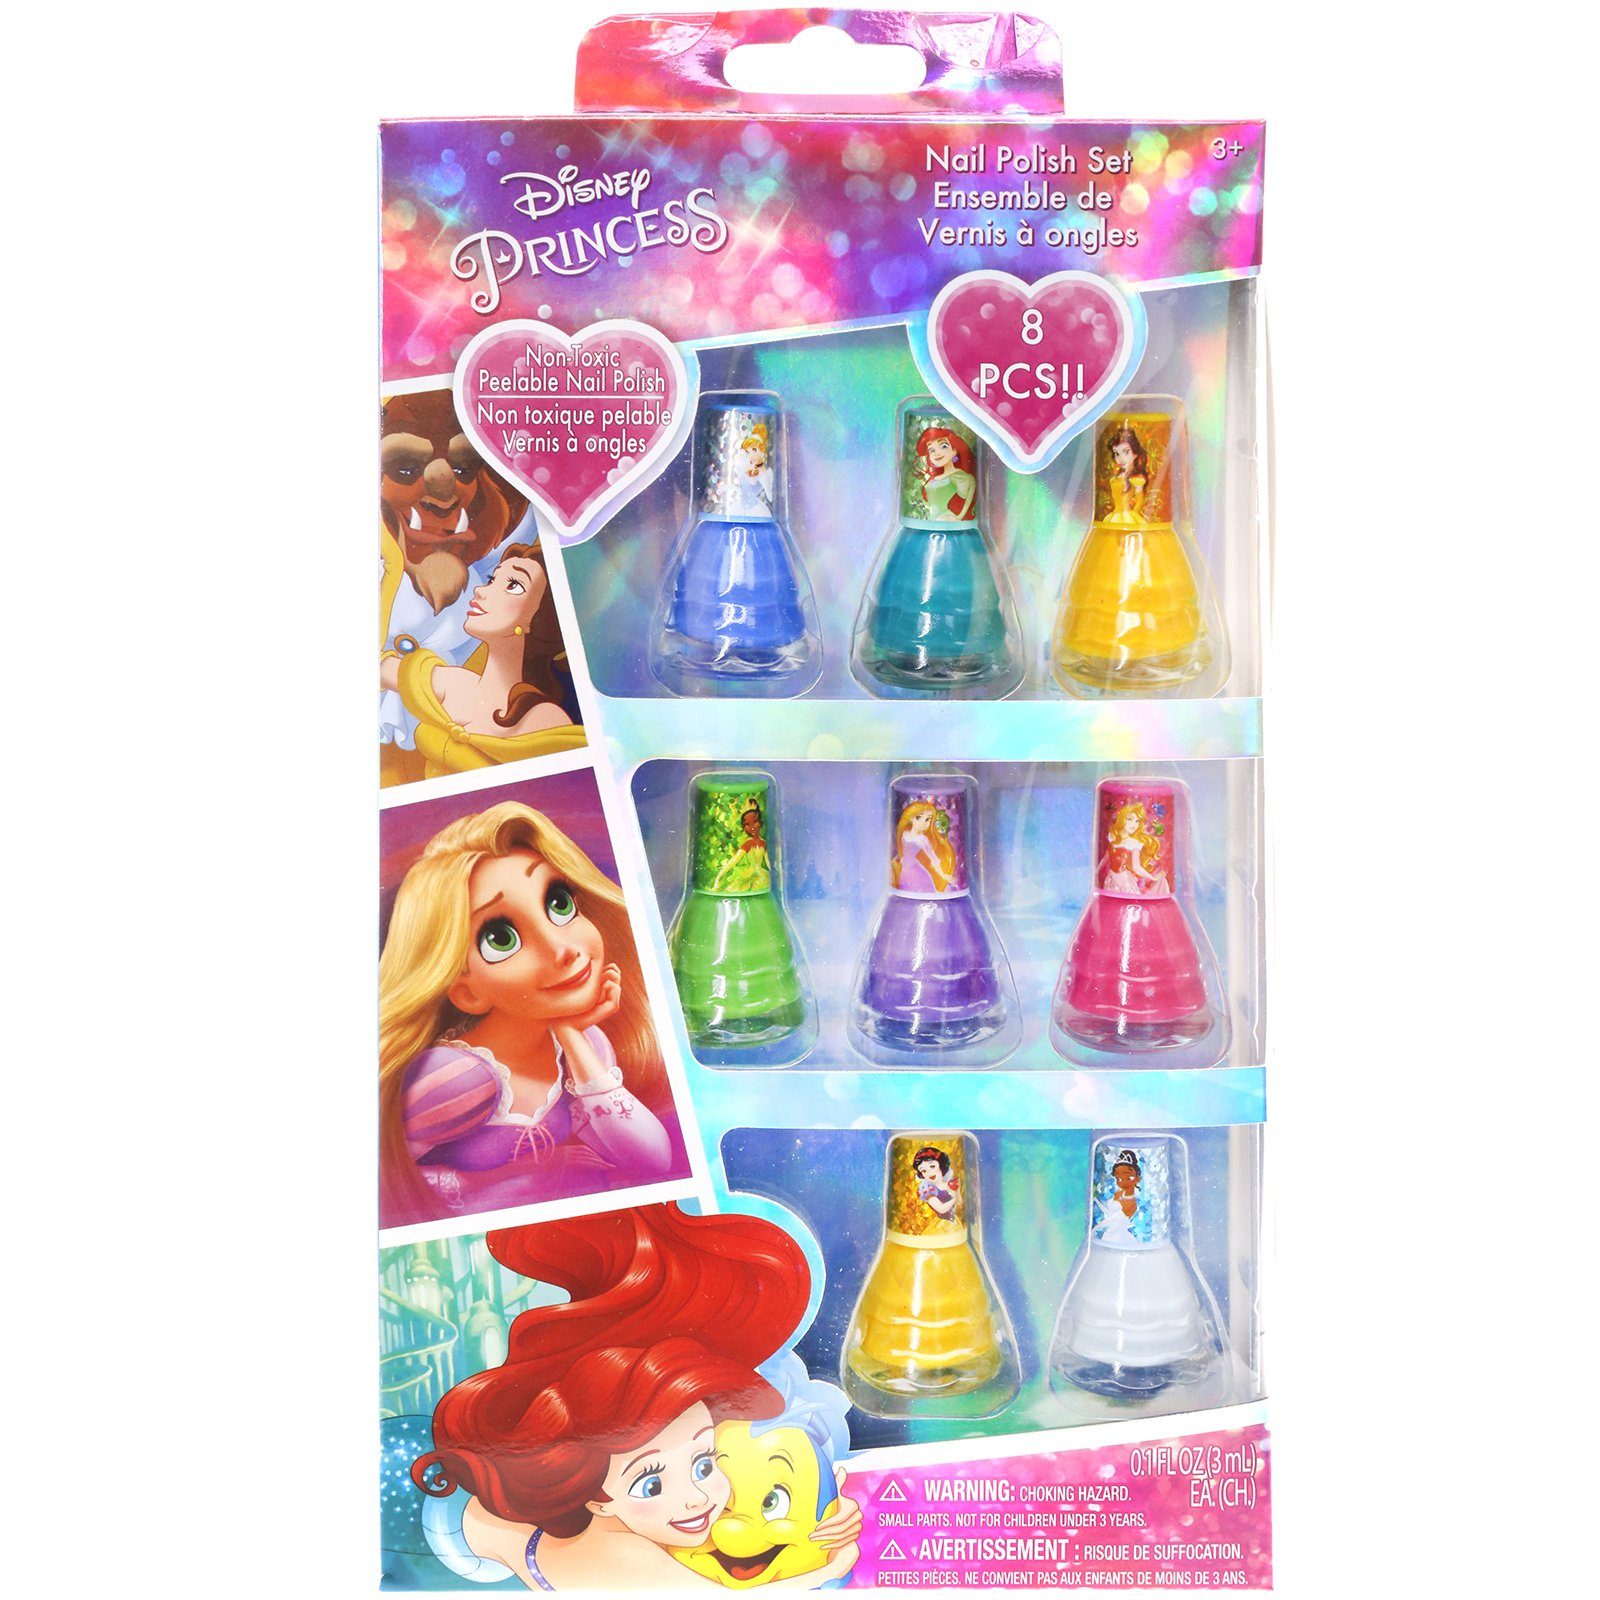 Townley Girl Disney Princess Non Toxic Peel Off Nail: TownleyGirl-Disney-Princess-Peel-Off-Nail-Polish-Gift-Set